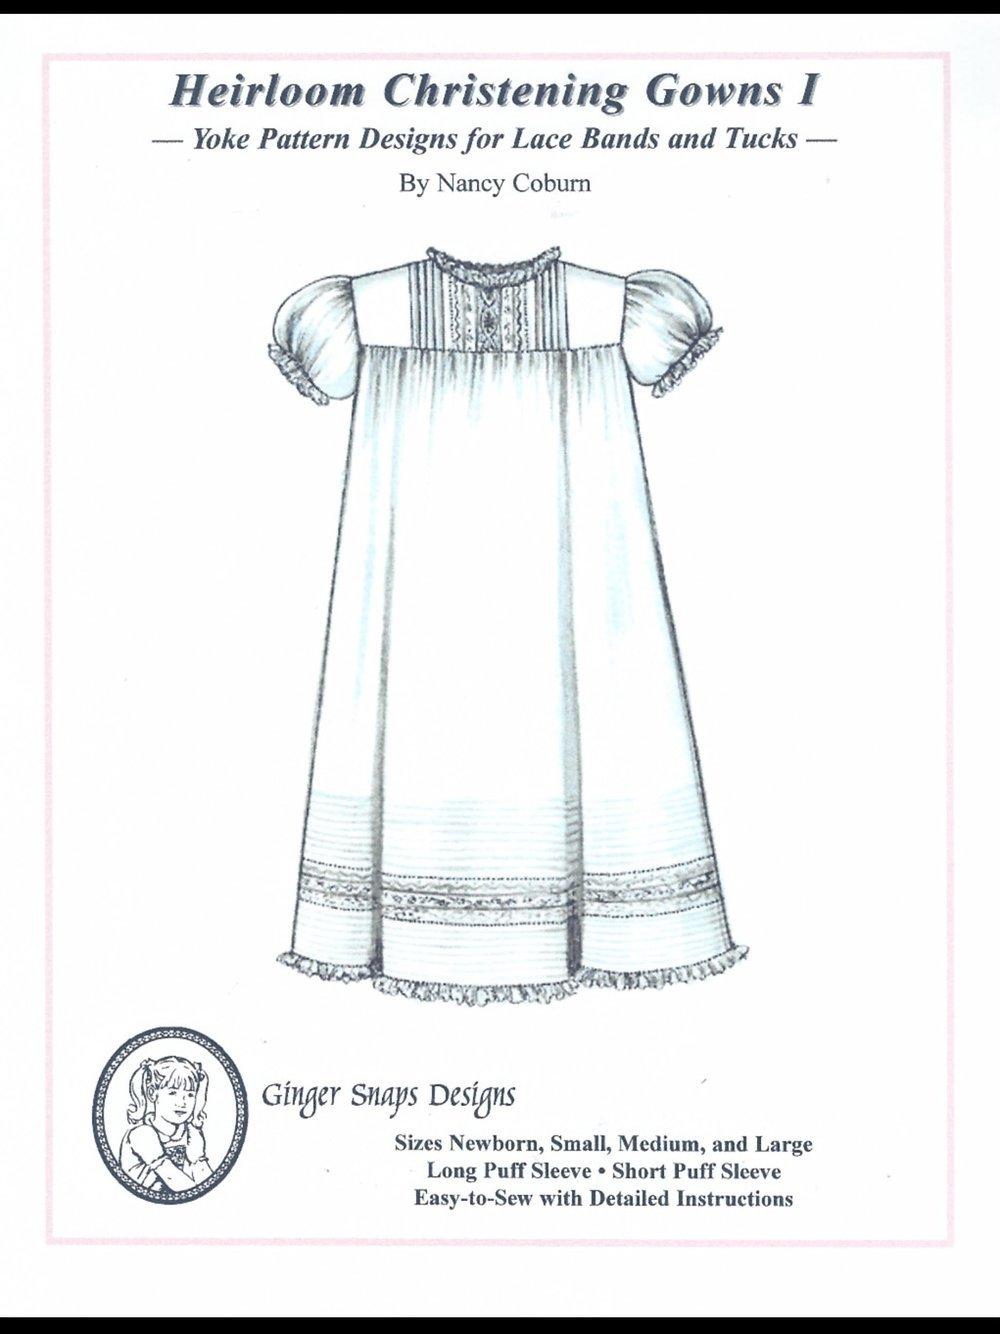 Ginger Snaps Designs Heirloom Christening Gowns I